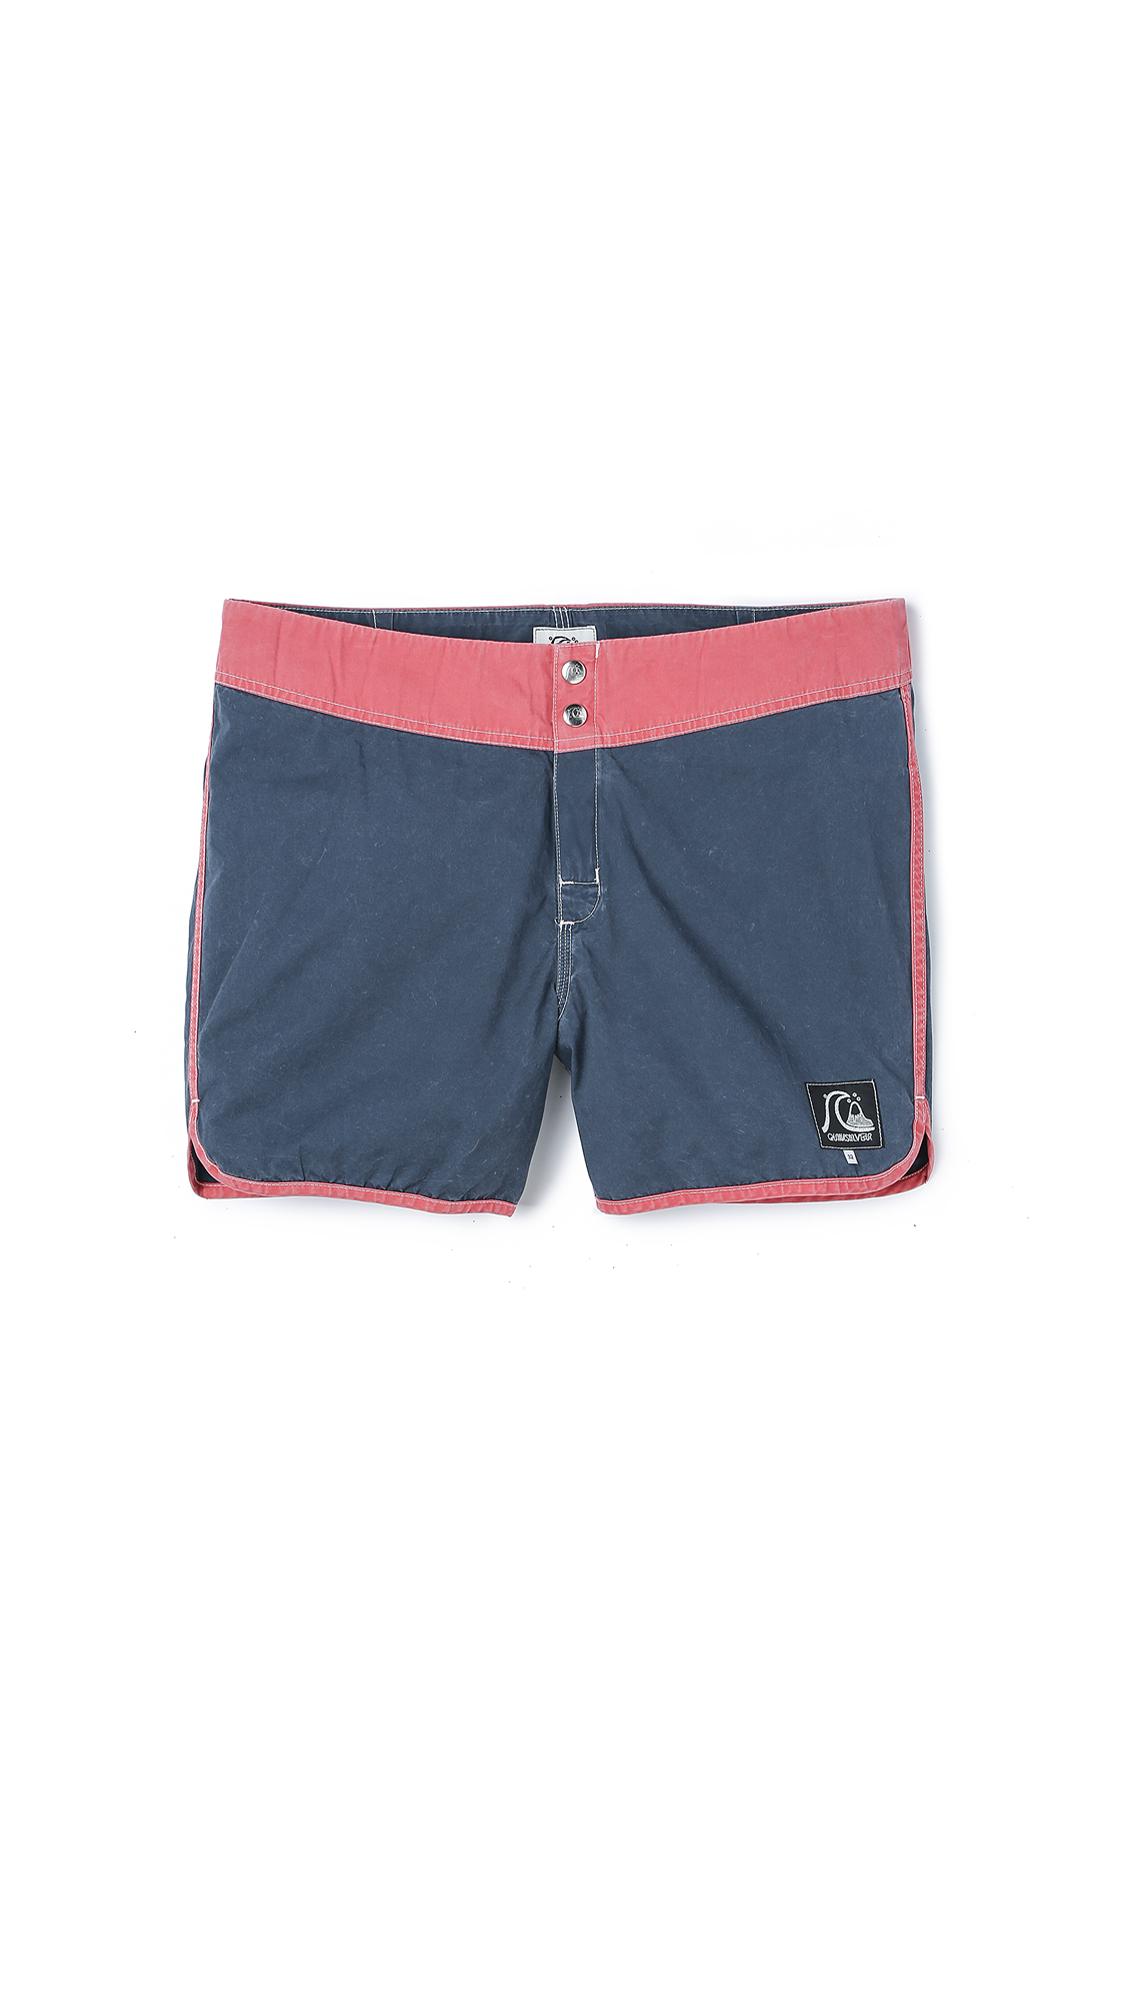 Lyst Quiksilver Original Scallop 15 Board Shorts In Blue For Men Boardshort Mens Gallery